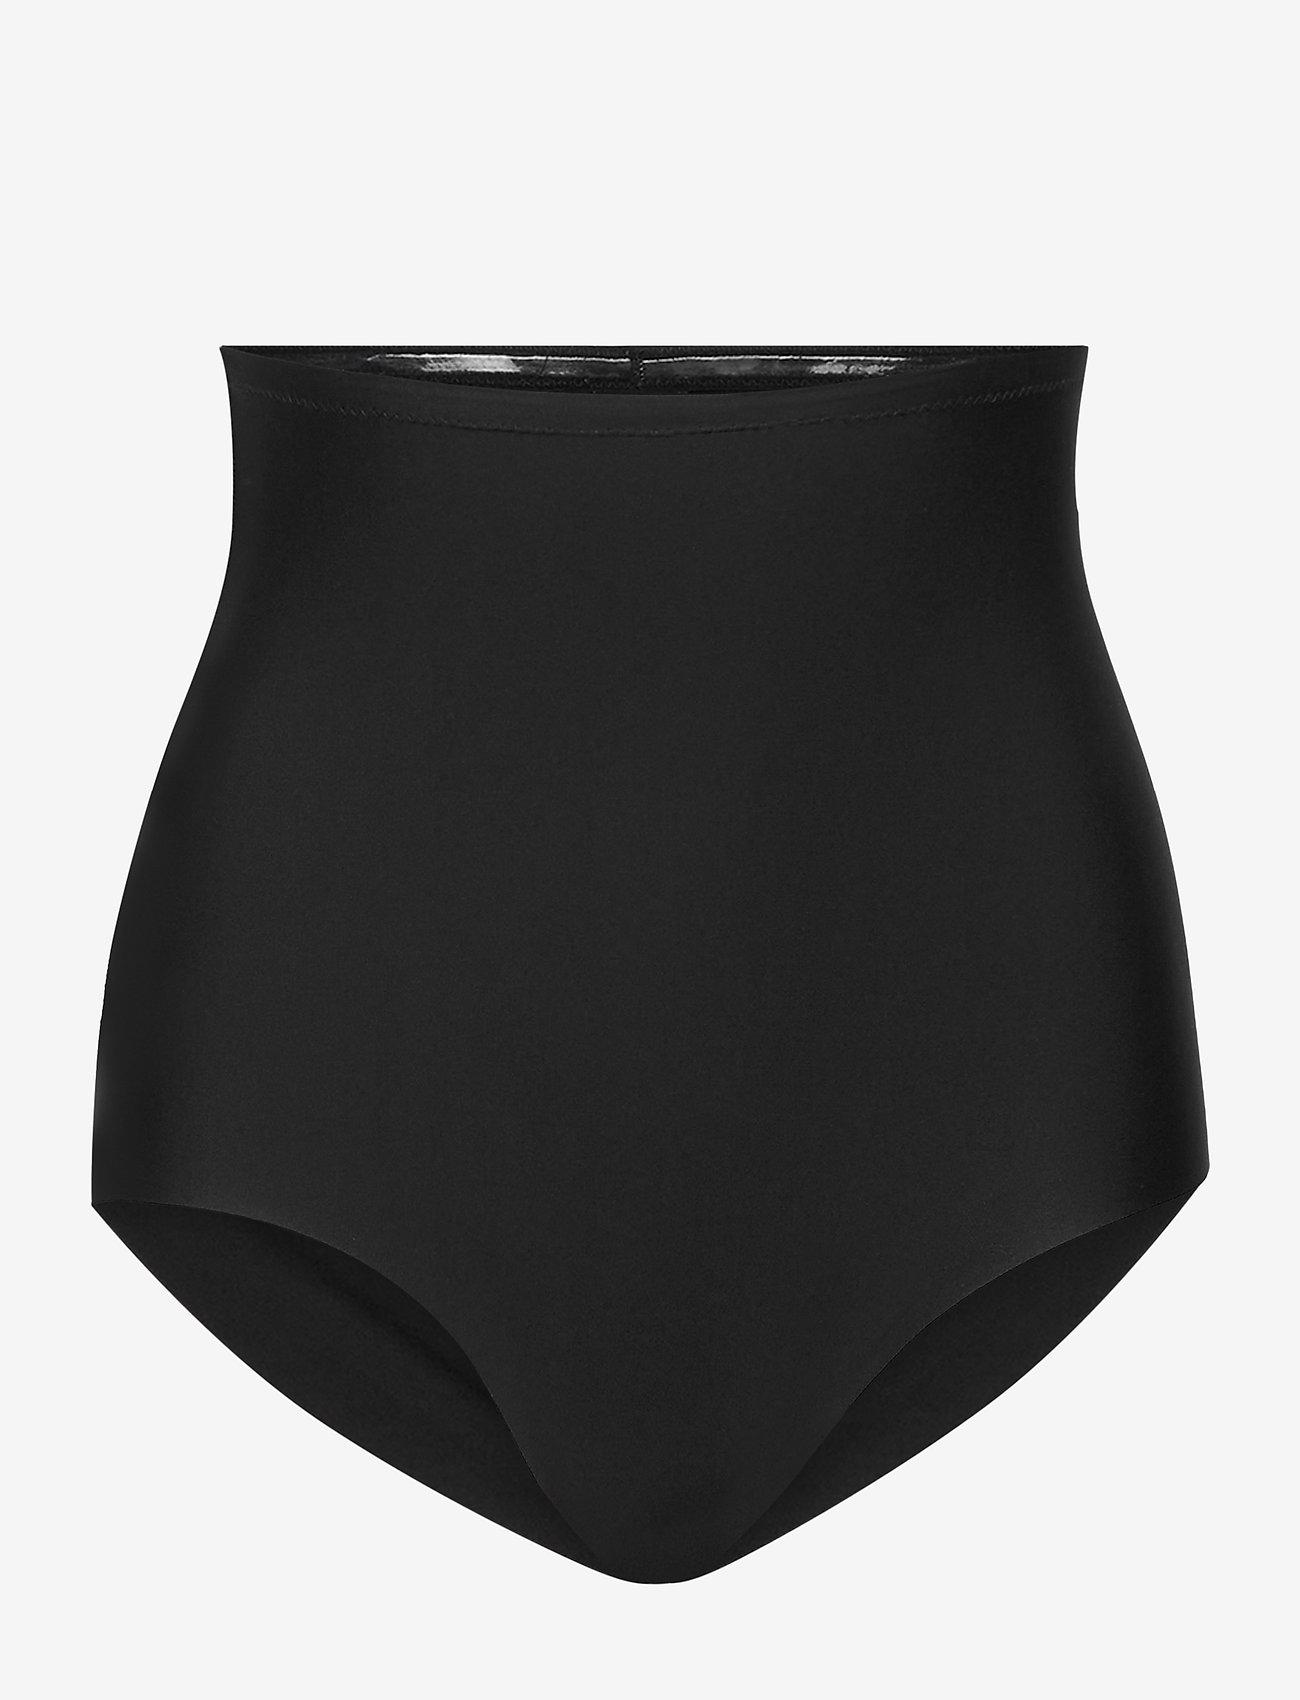 Decoy - DECOY Shapewear brief - bottoms - svart - 0